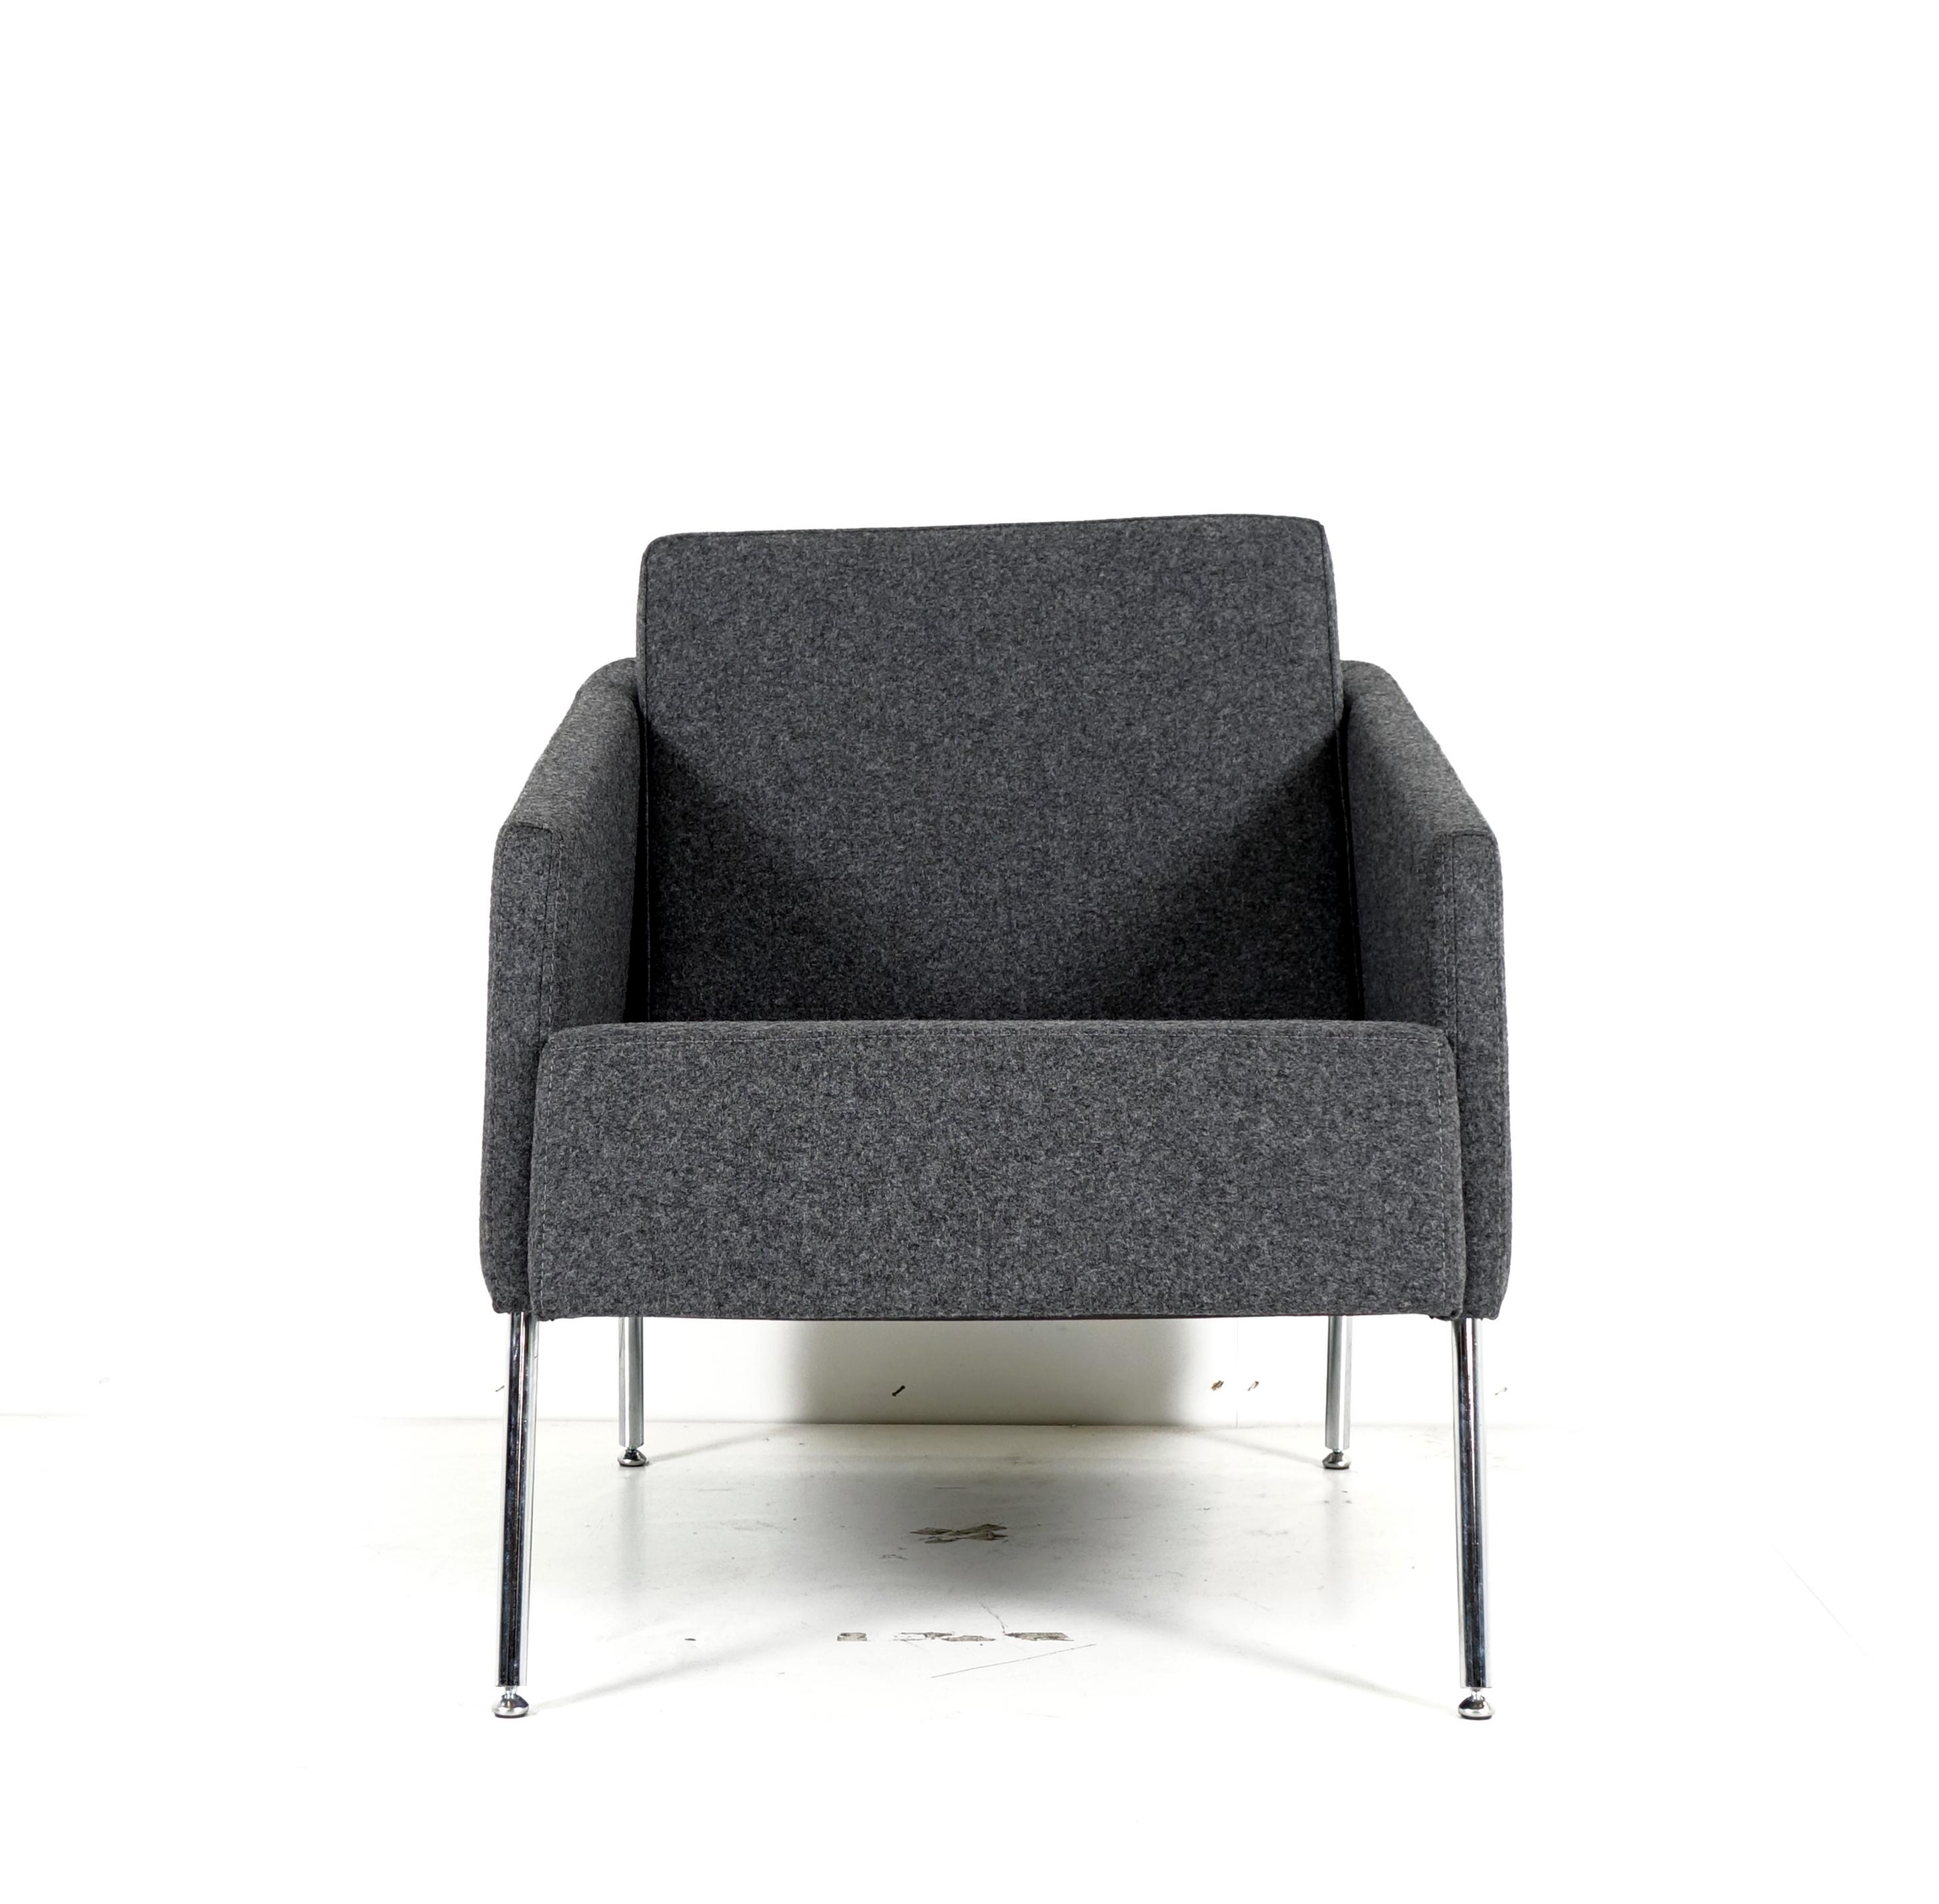 Ress Reception Chair